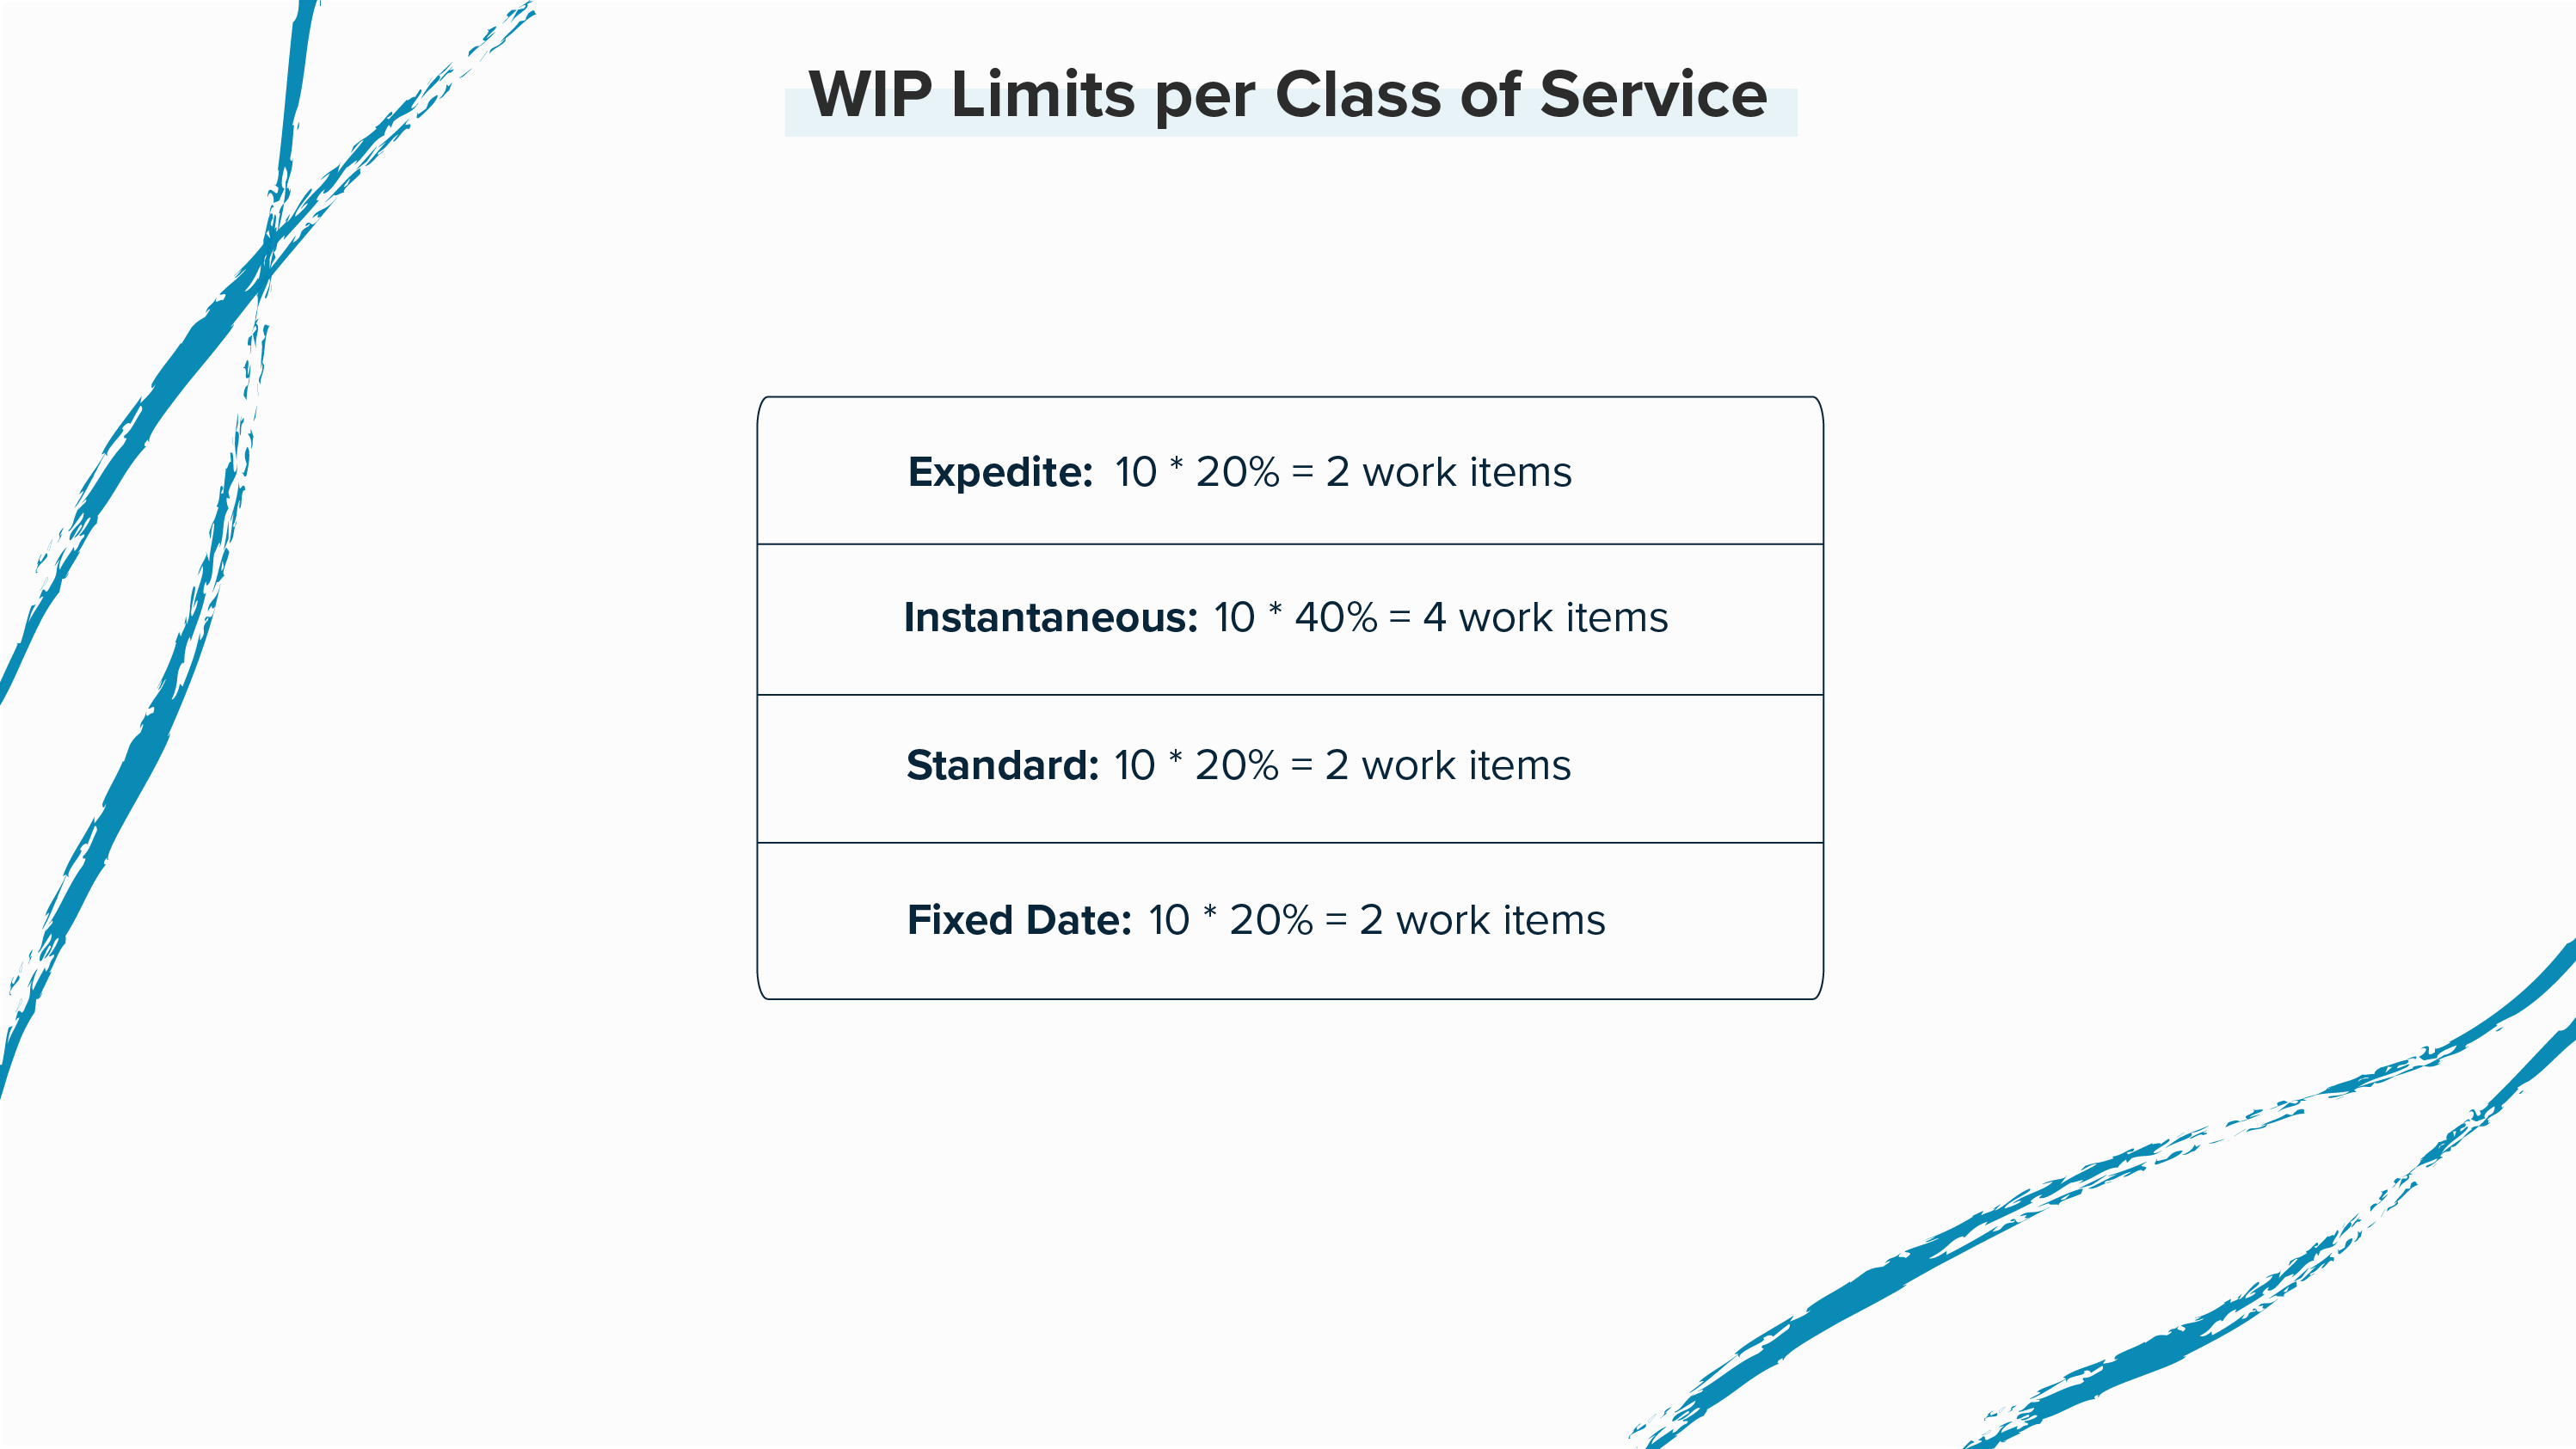 WIP limits per class of service